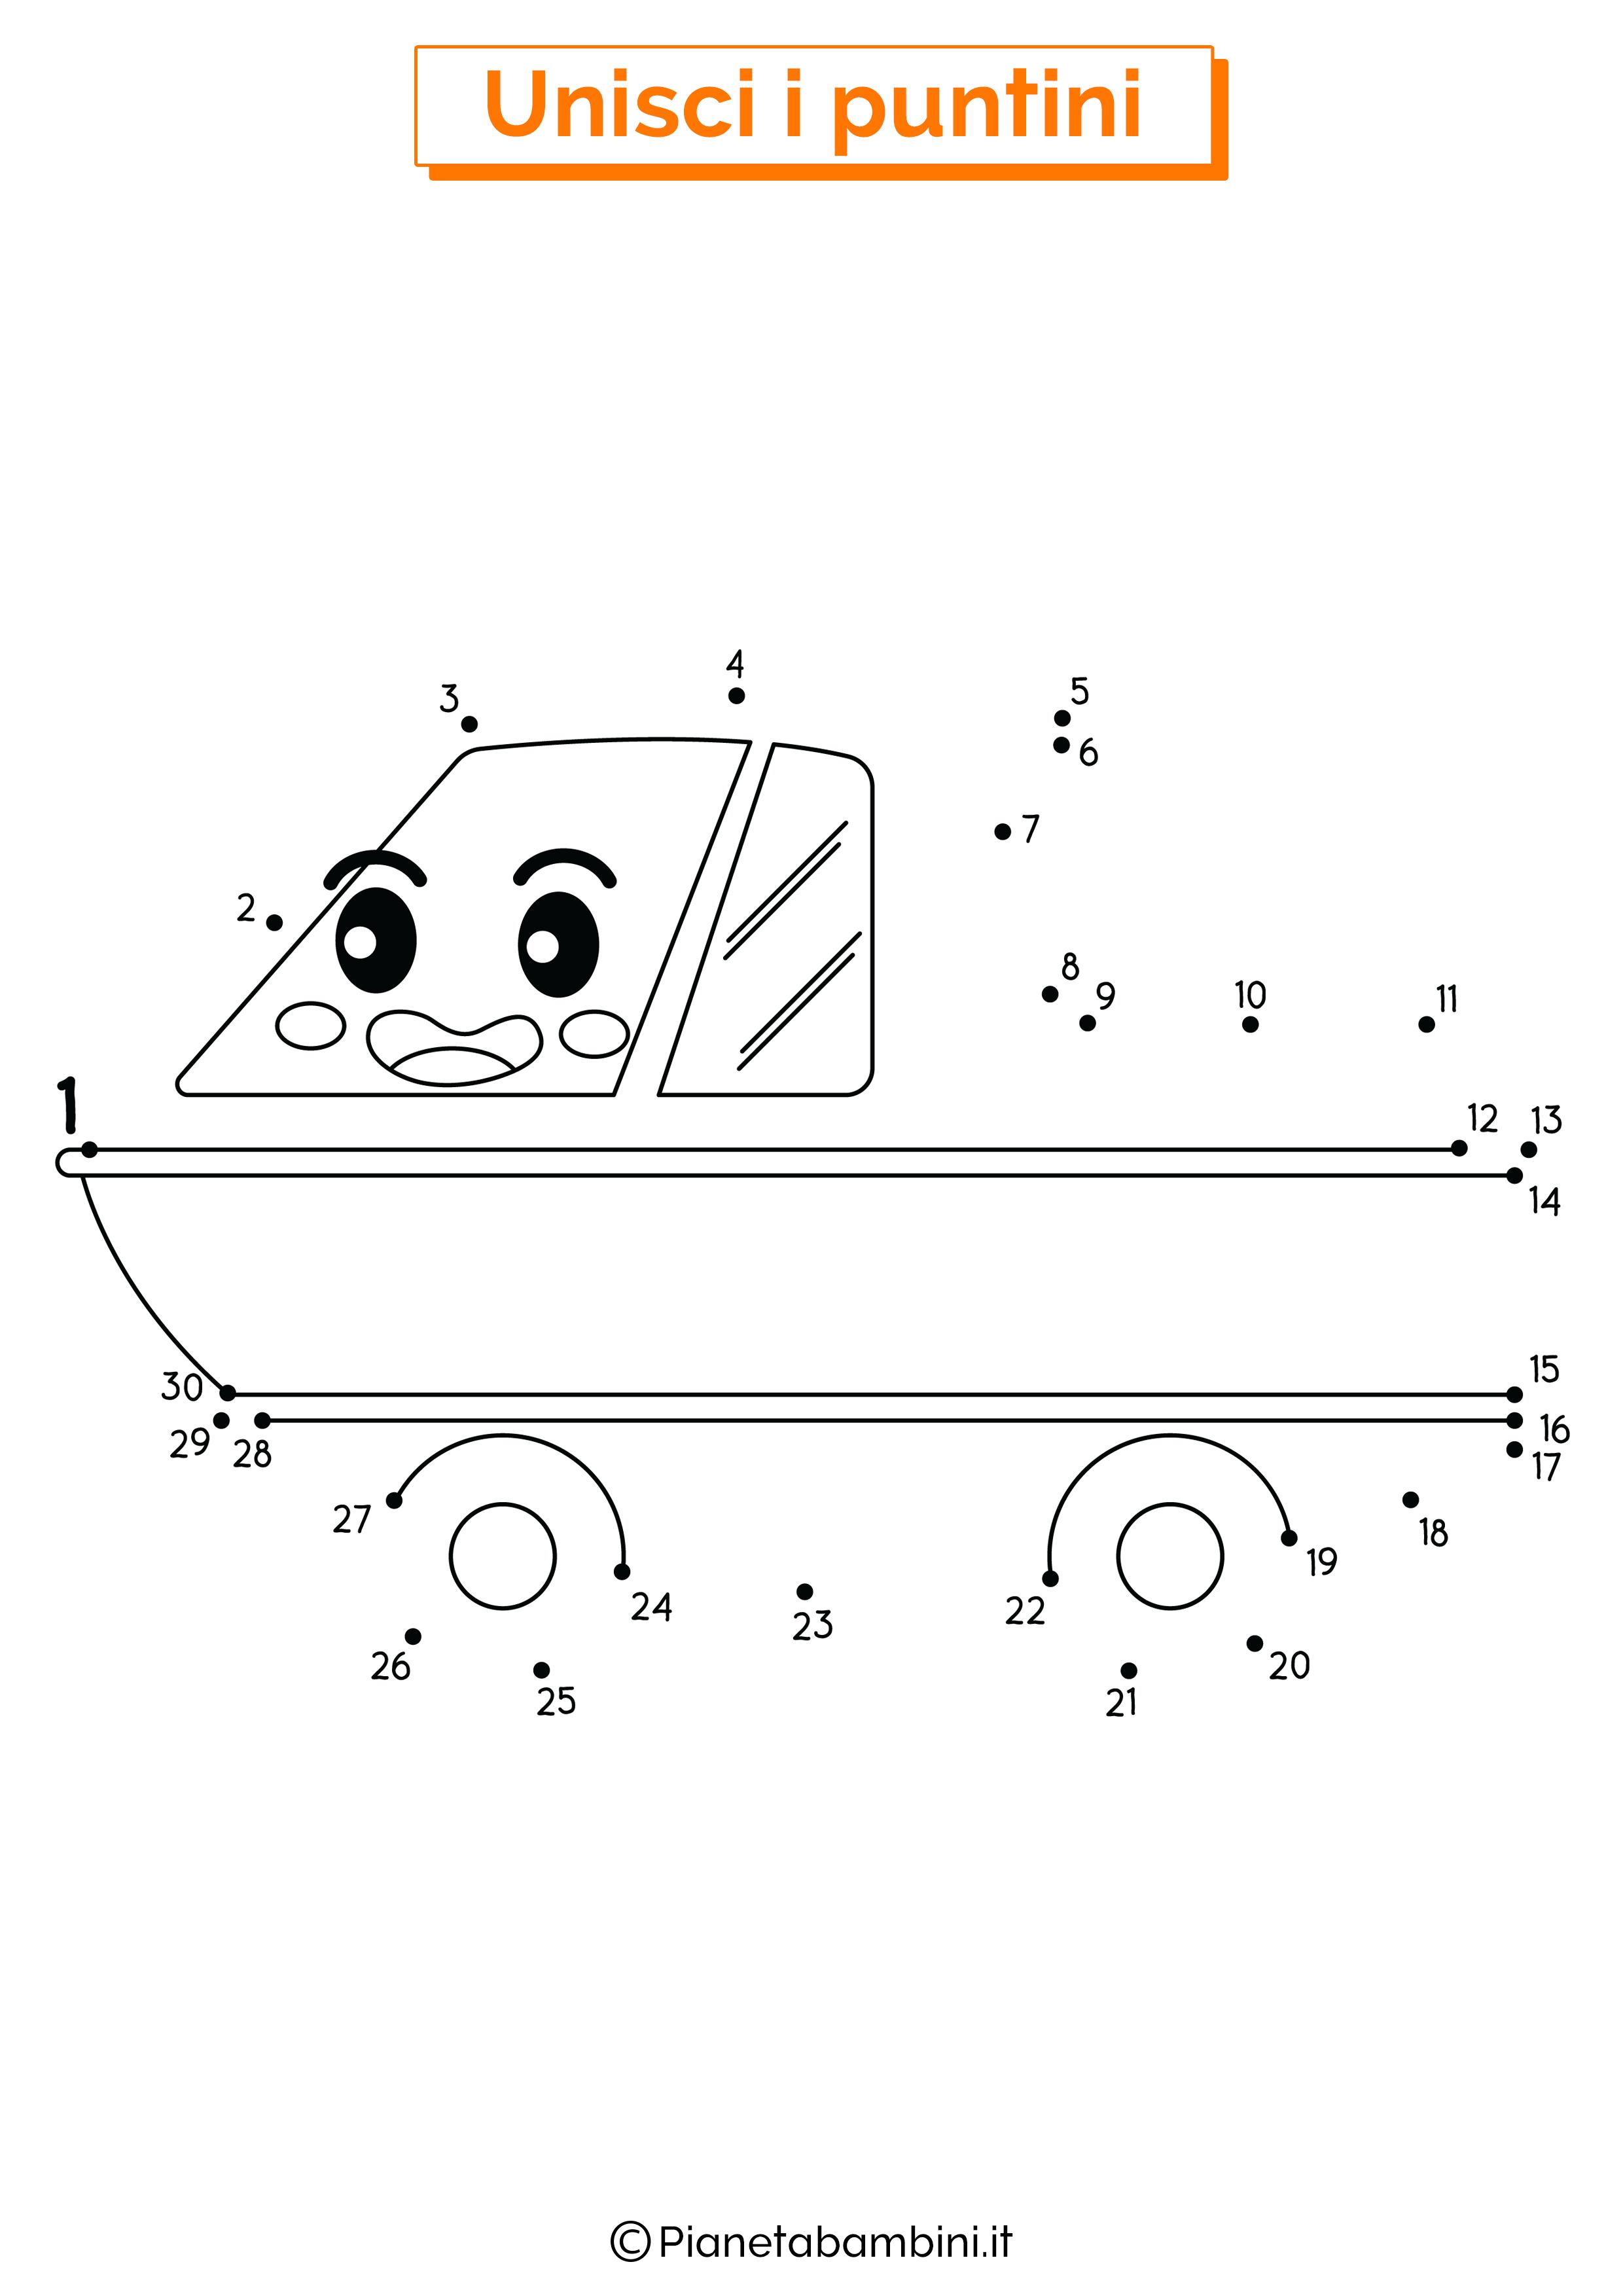 Disegno unisci i puntini veicolo anfibio